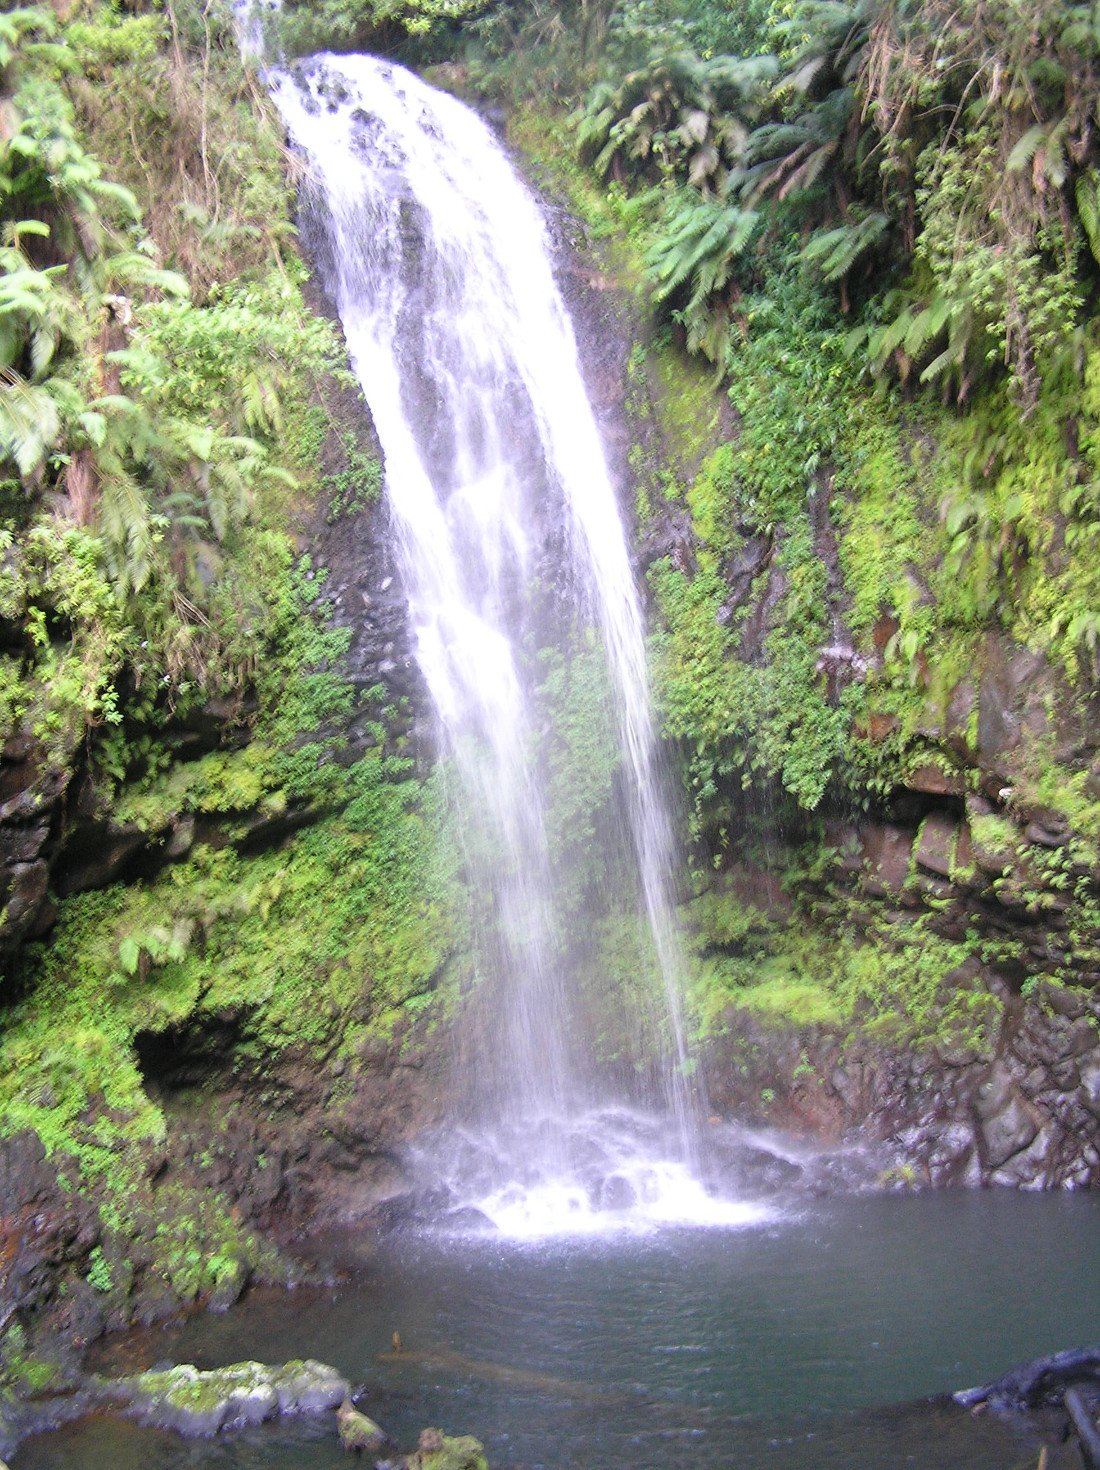 Madagaskar Wasserfall im Norden Iwanowskis Reisen - afrika.de